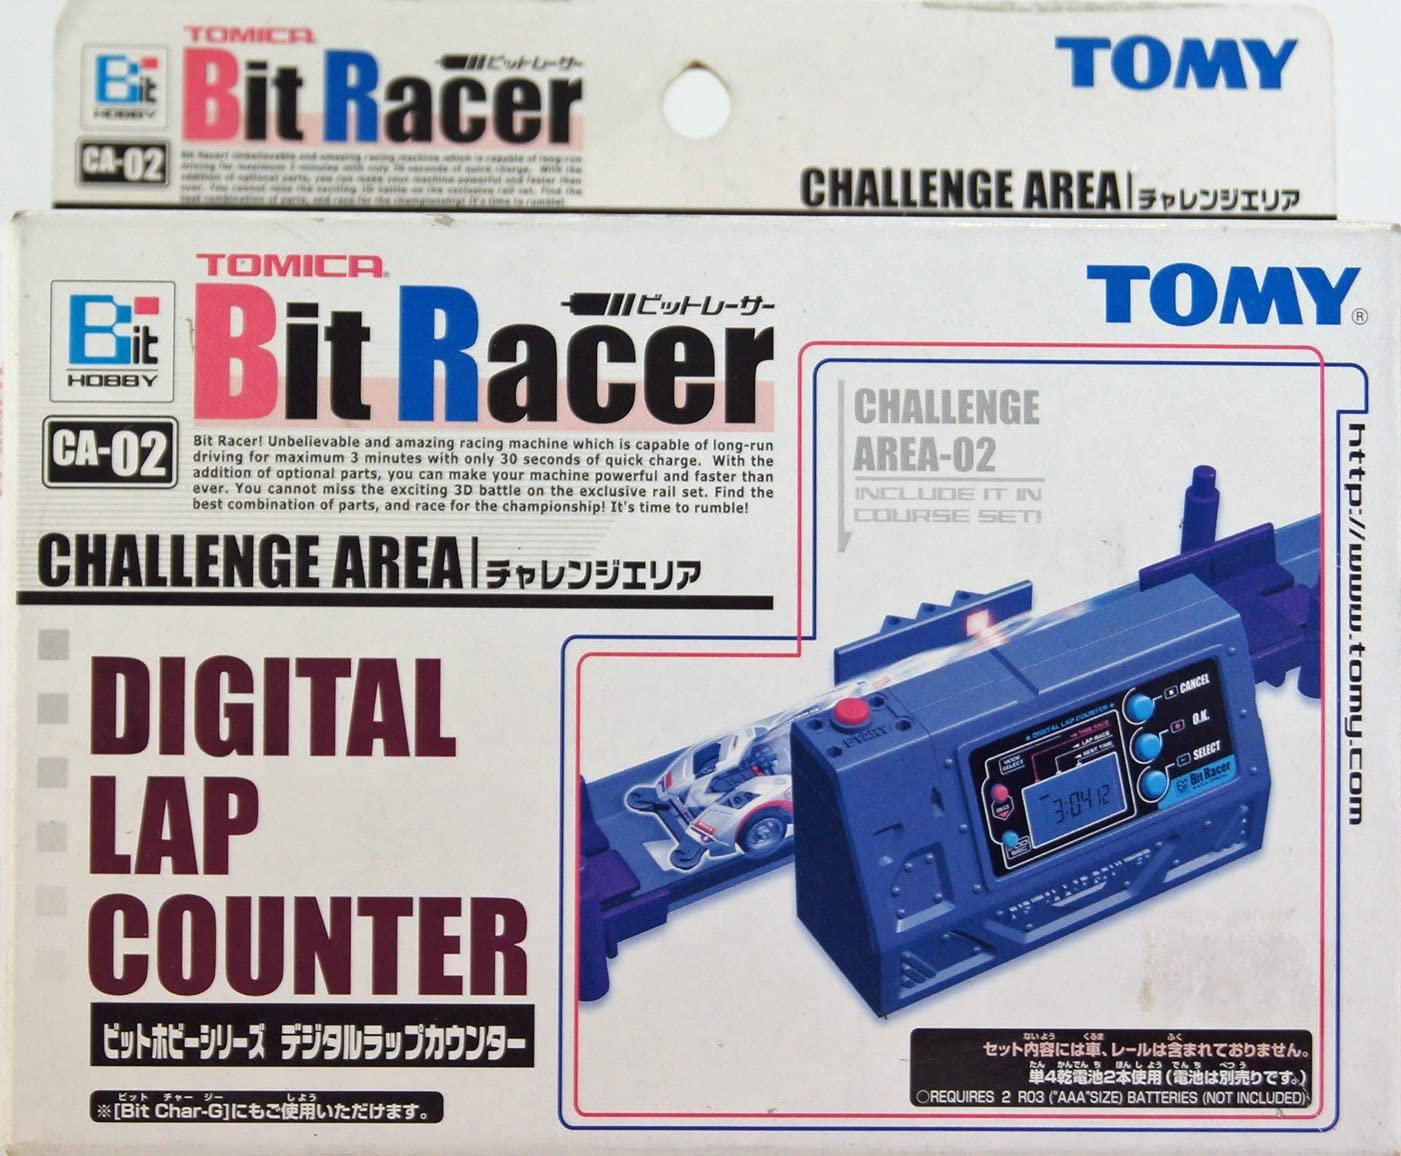 TOMICA Bit Char-G: Digital Lap Counter CA-02